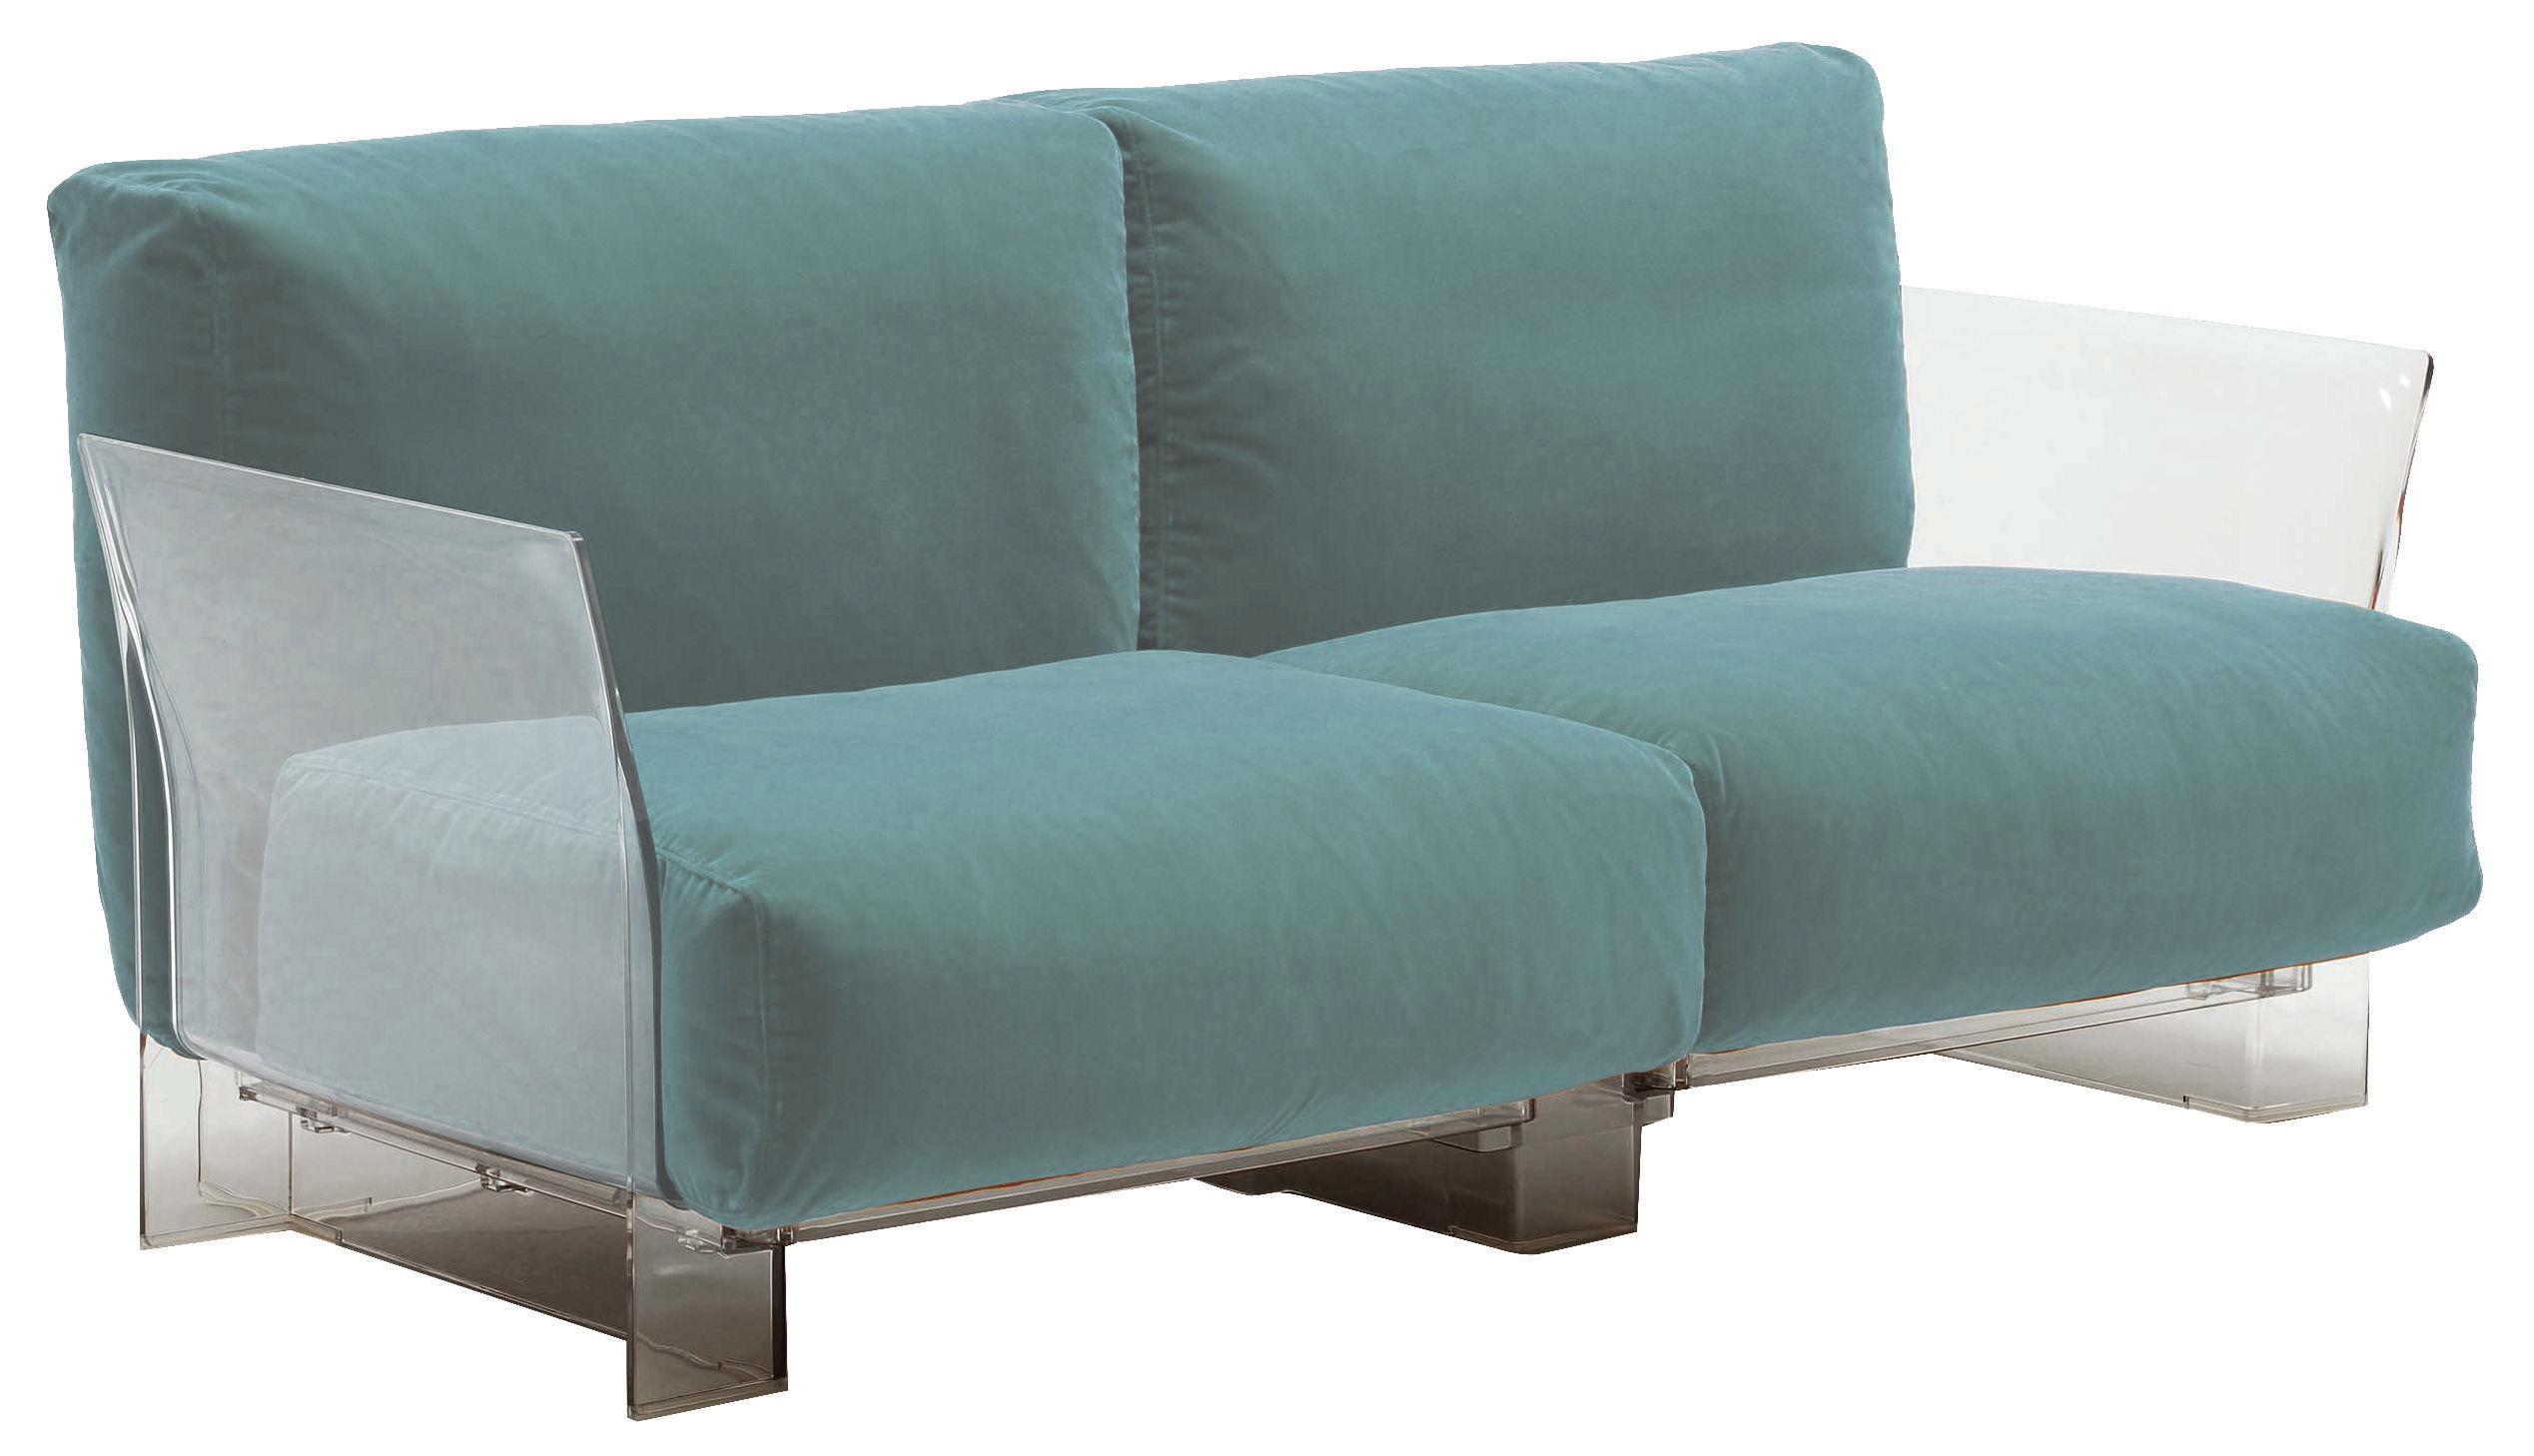 canap droit pop outdoor 2 places l 175 cm bleu ciel kartell. Black Bedroom Furniture Sets. Home Design Ideas